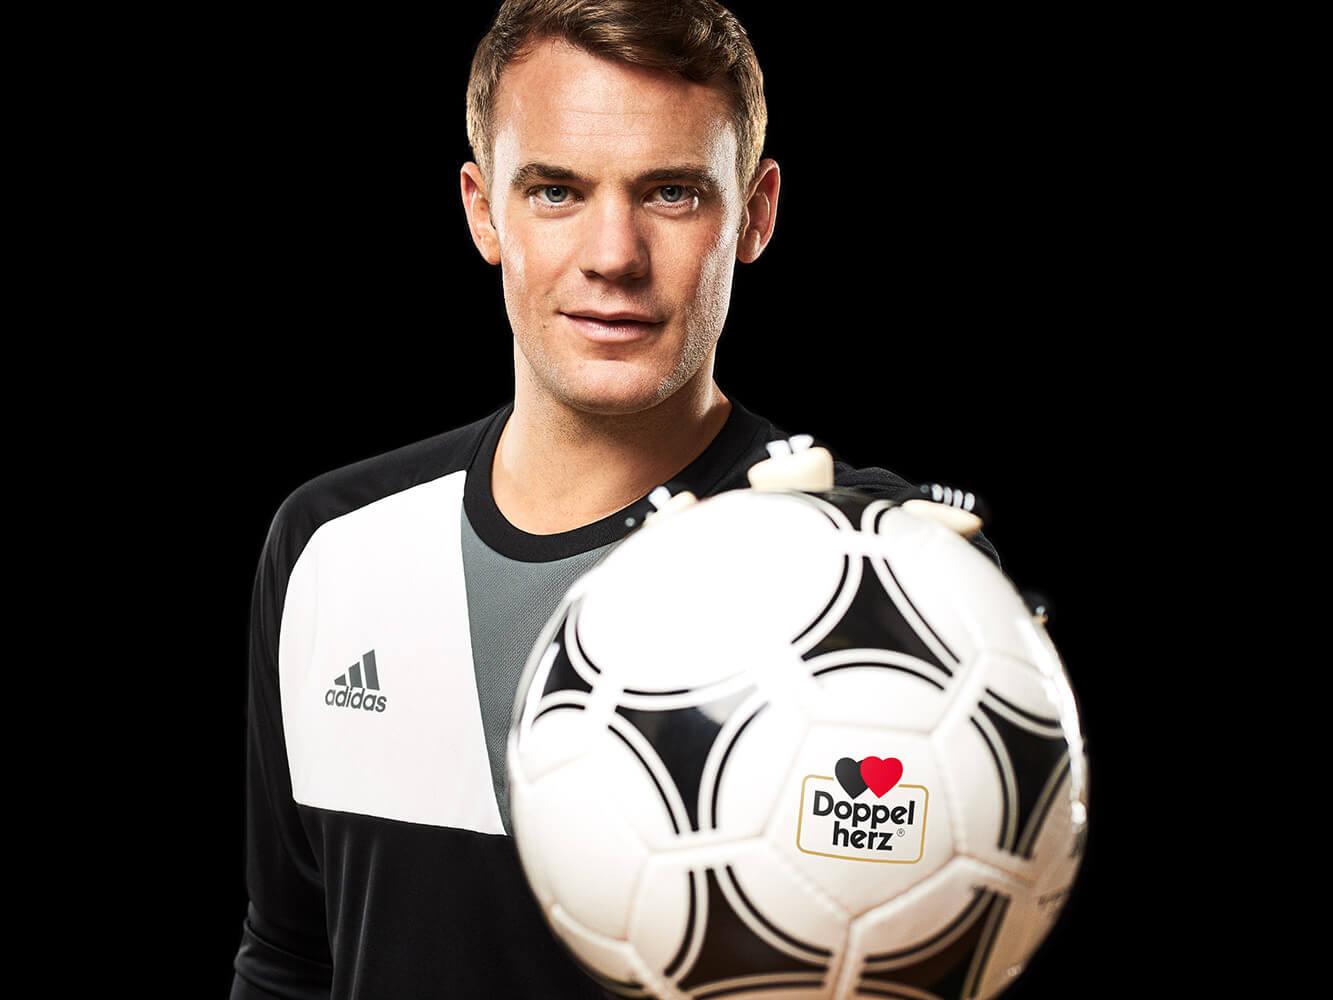 Manuel Neuer Doppelherz Queisser Pharma Fussball